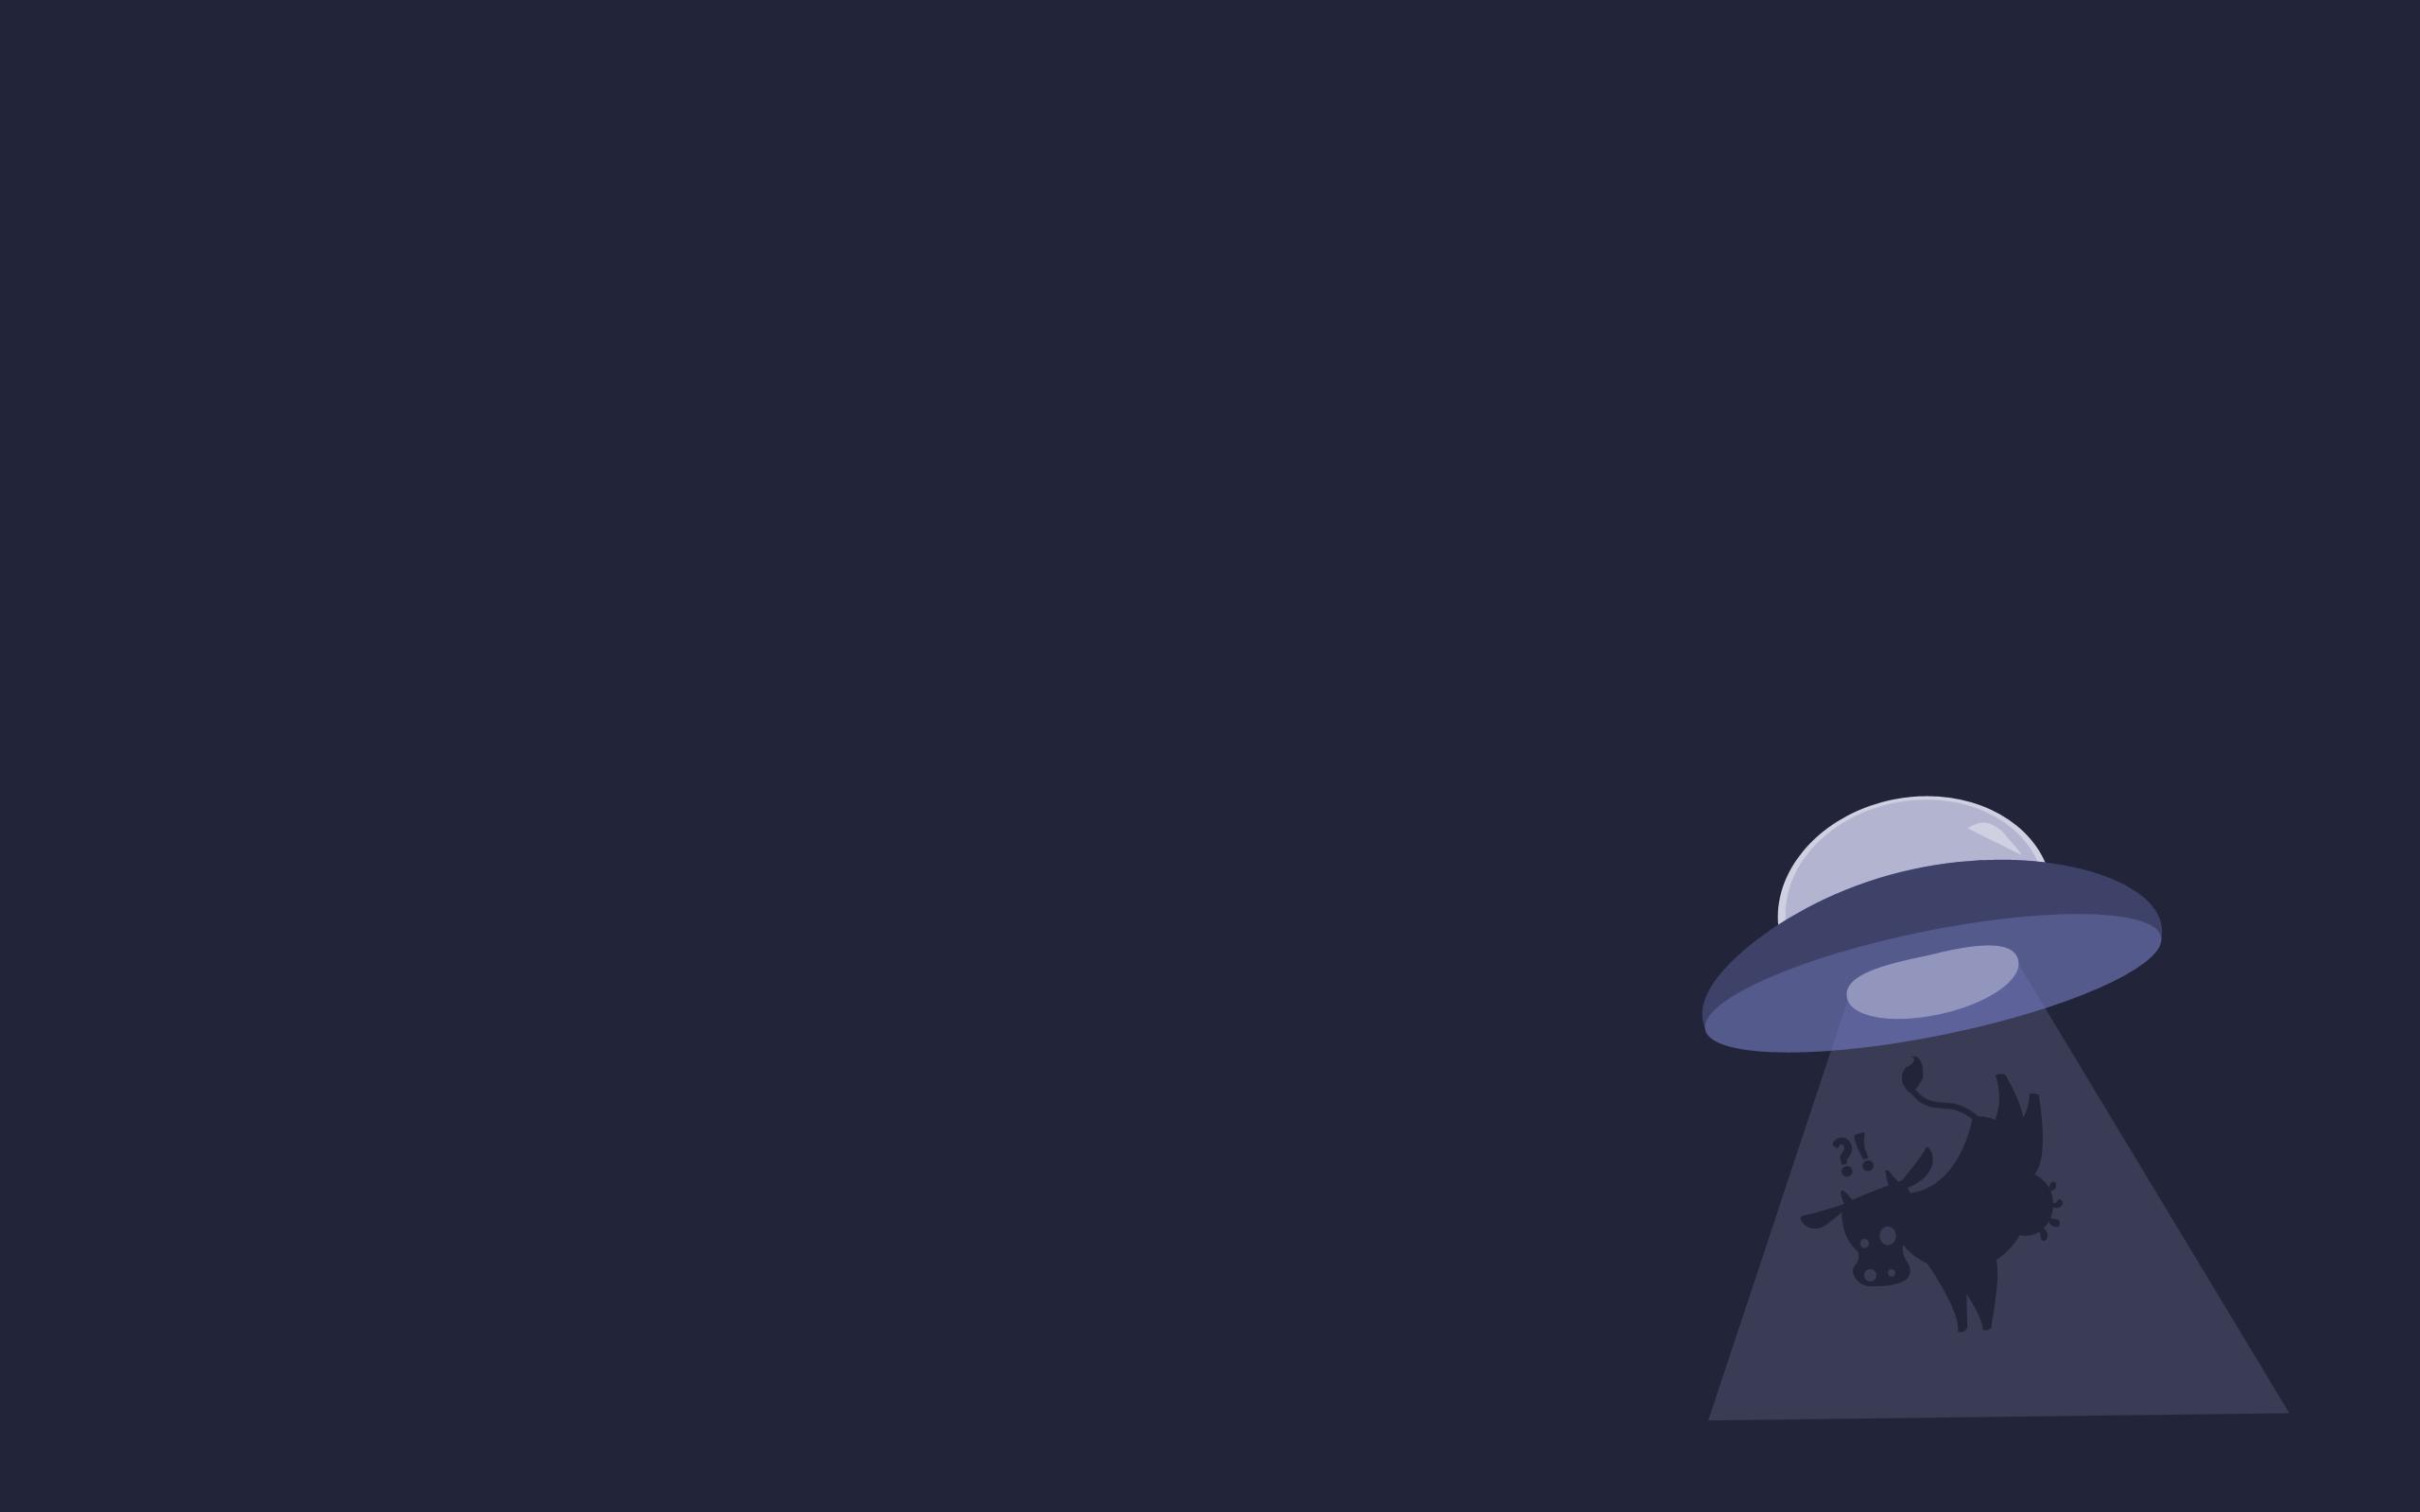 Minimalistic gentoo cows ufo abduction alien wallpaper 2560x1600 2560x1600